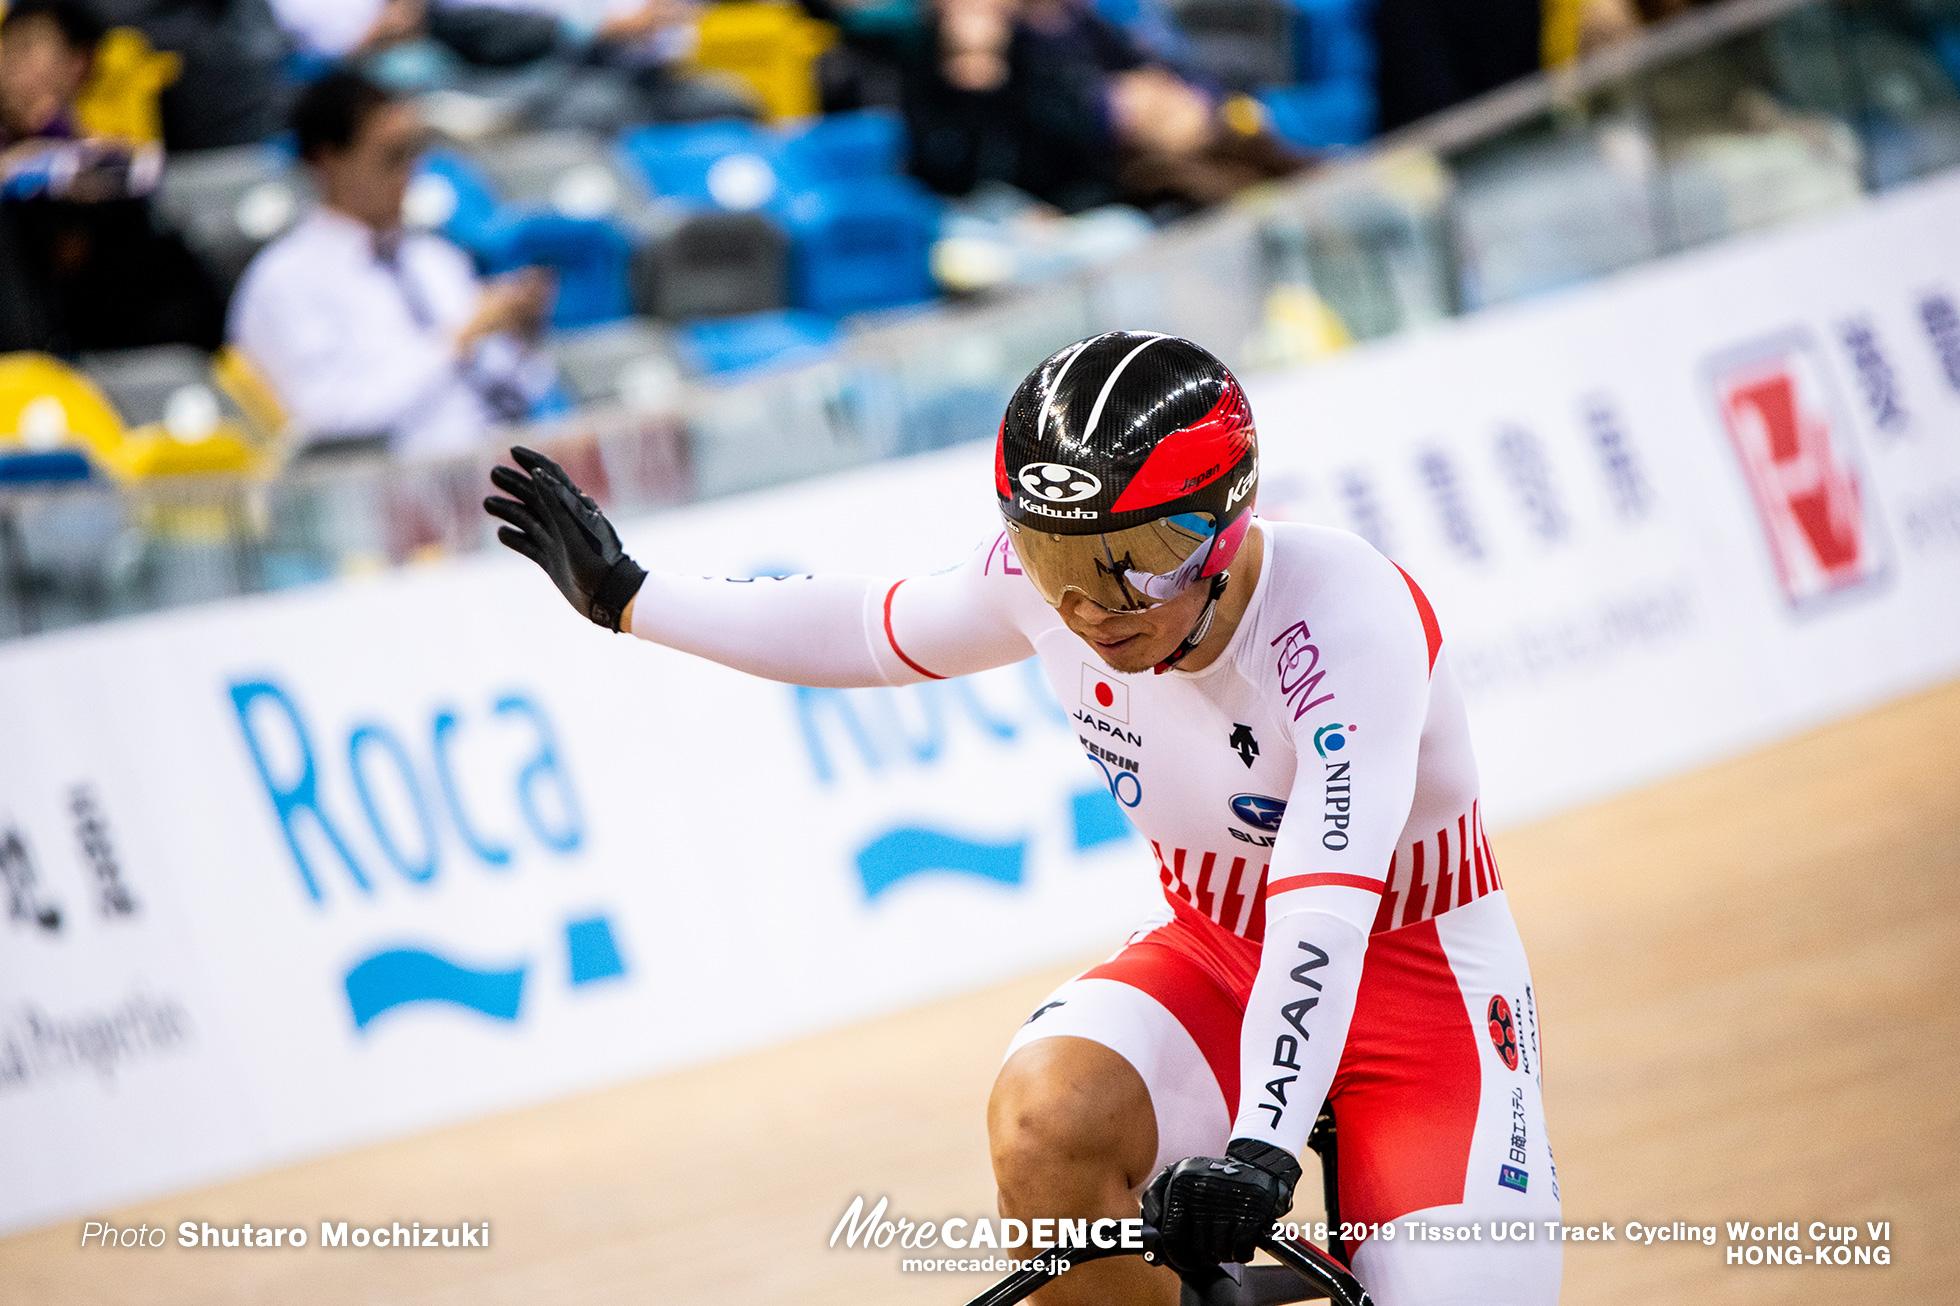 Final / Men's Team Sprint / Track Cycling World Cup VI / Hong-Kong